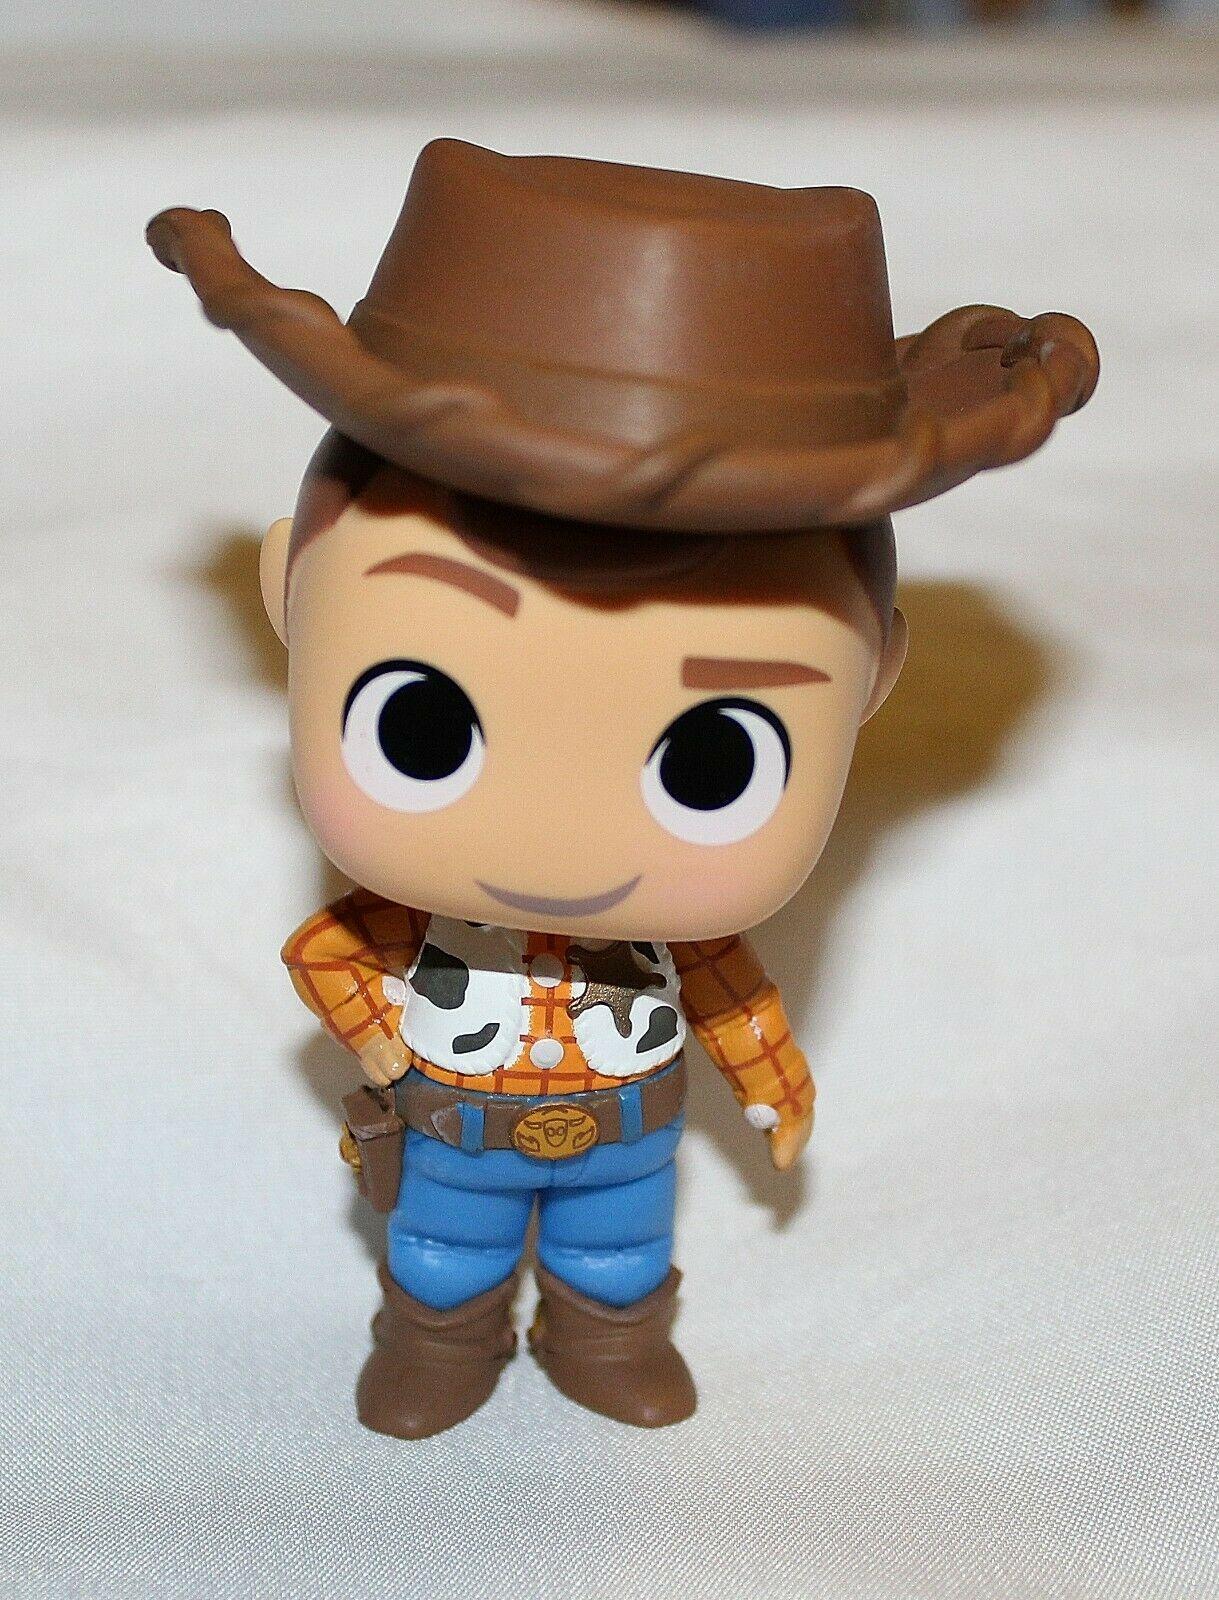 New Funko Mystery Minis Toy Story 4 Woody Bullseye 2 Pack Cowboy Horse Disney